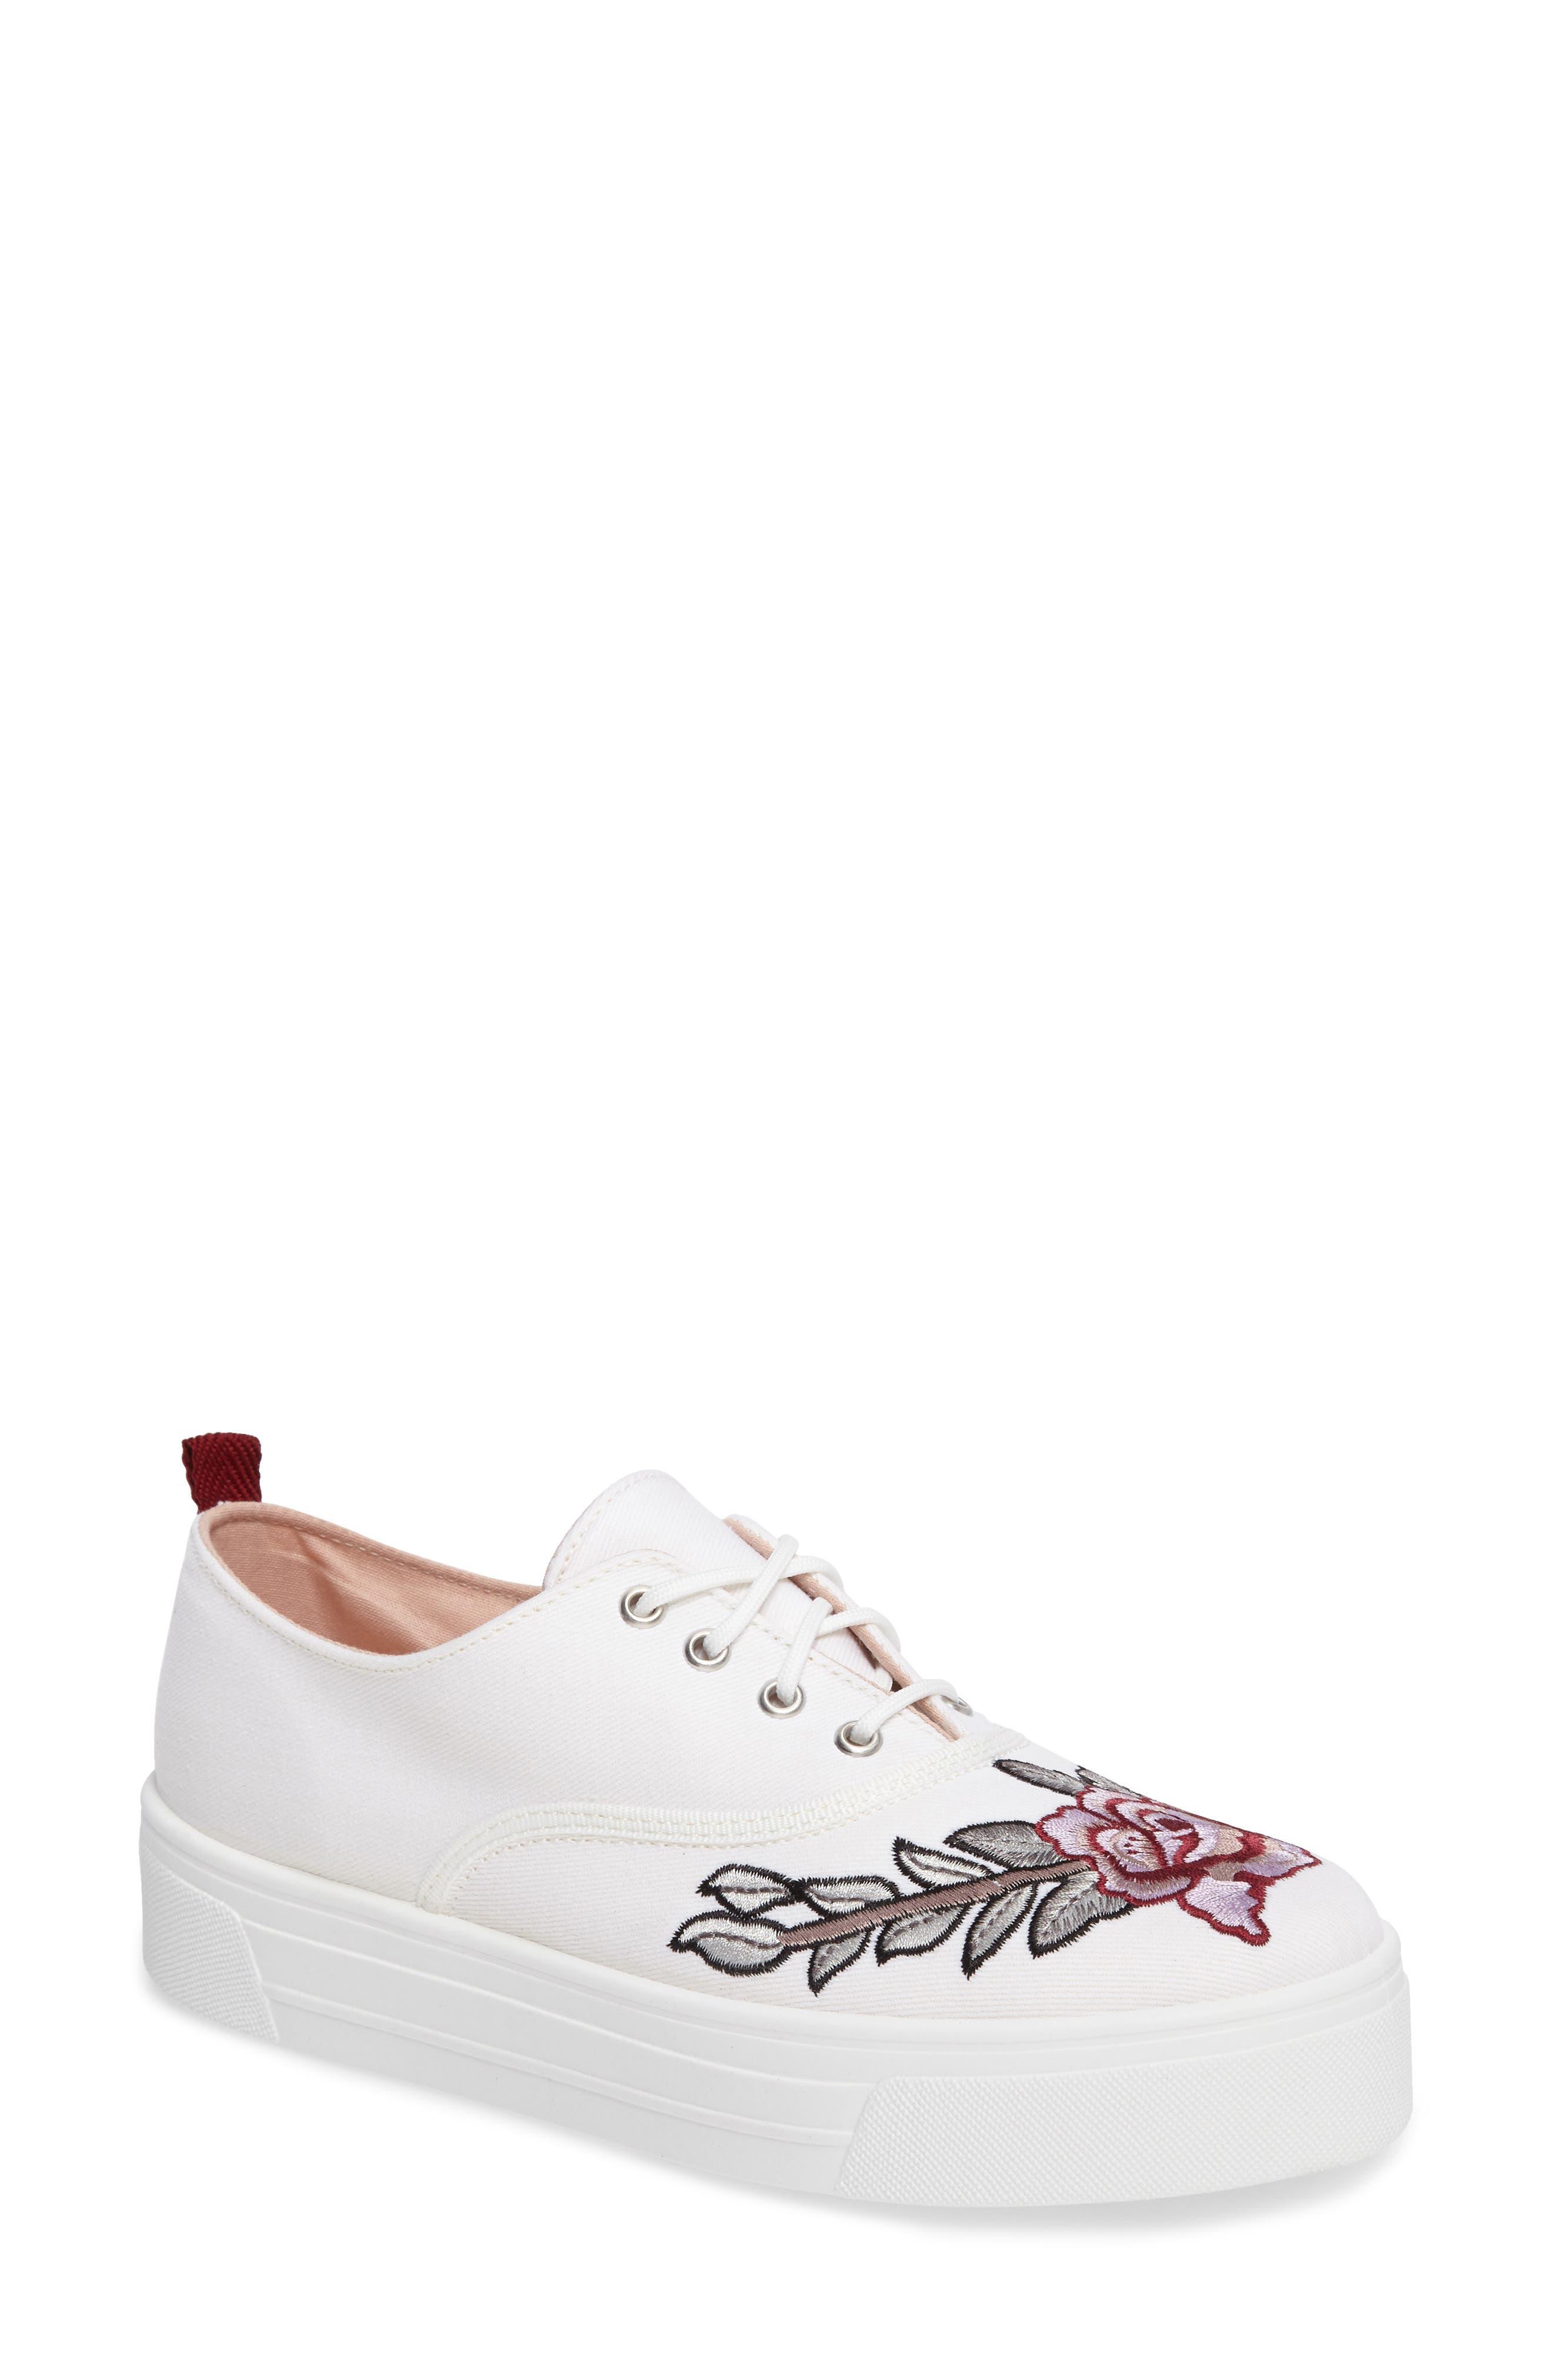 Topshop College Embroidered Flatform Sneaker (Women)